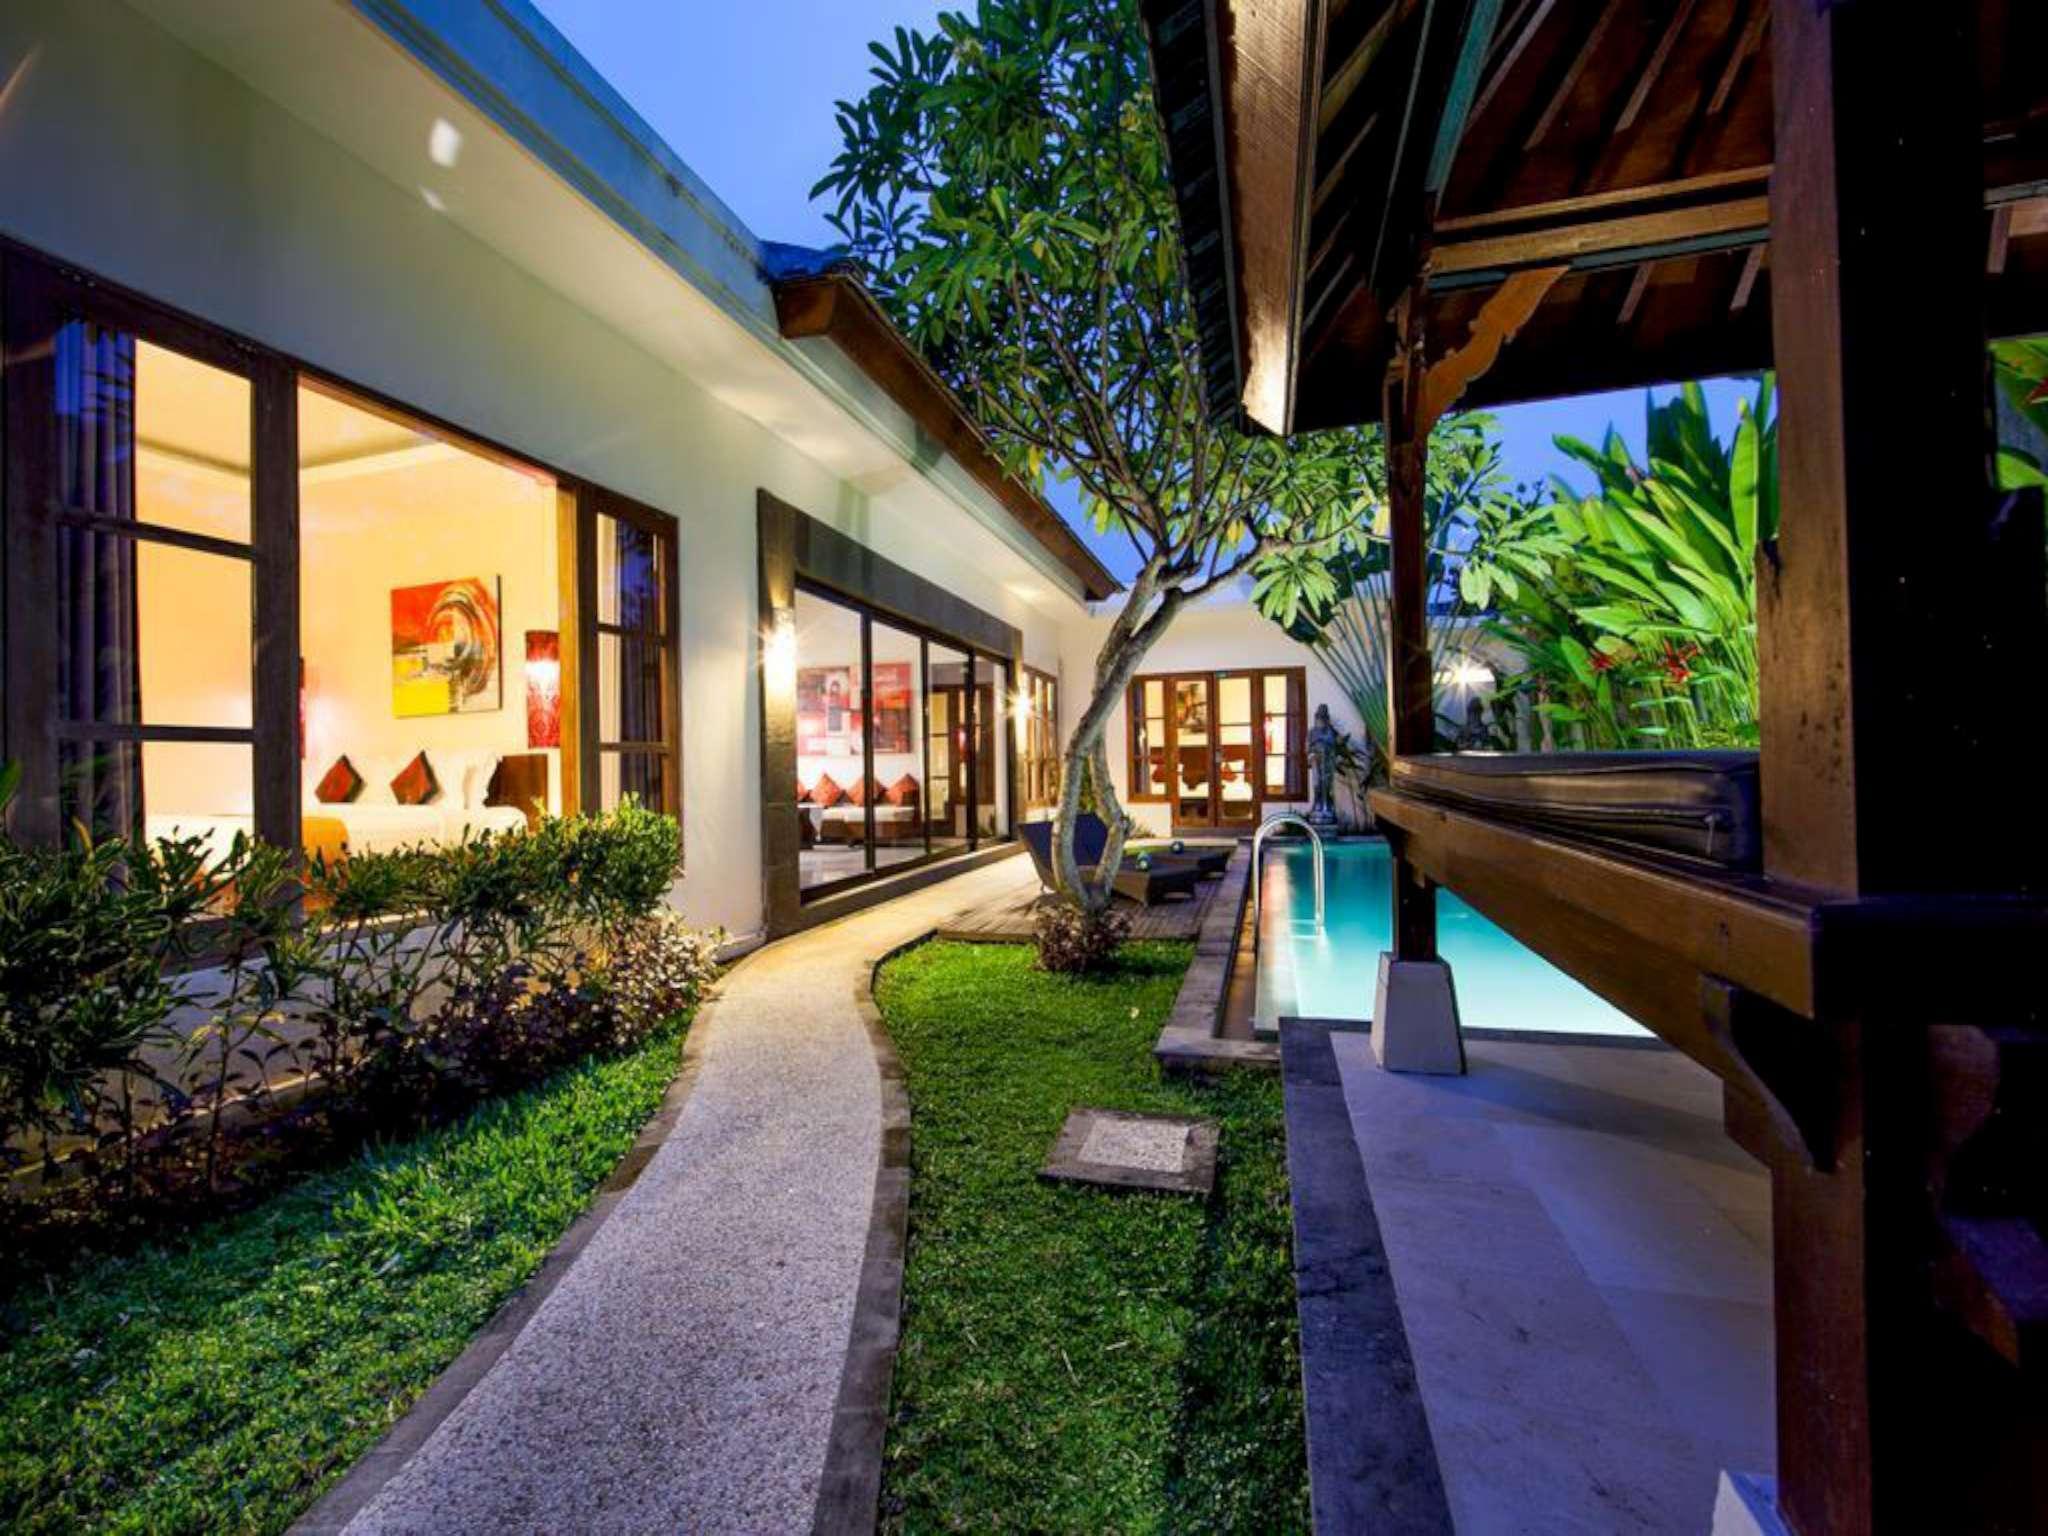 3 Bedroom Villas In Umalas